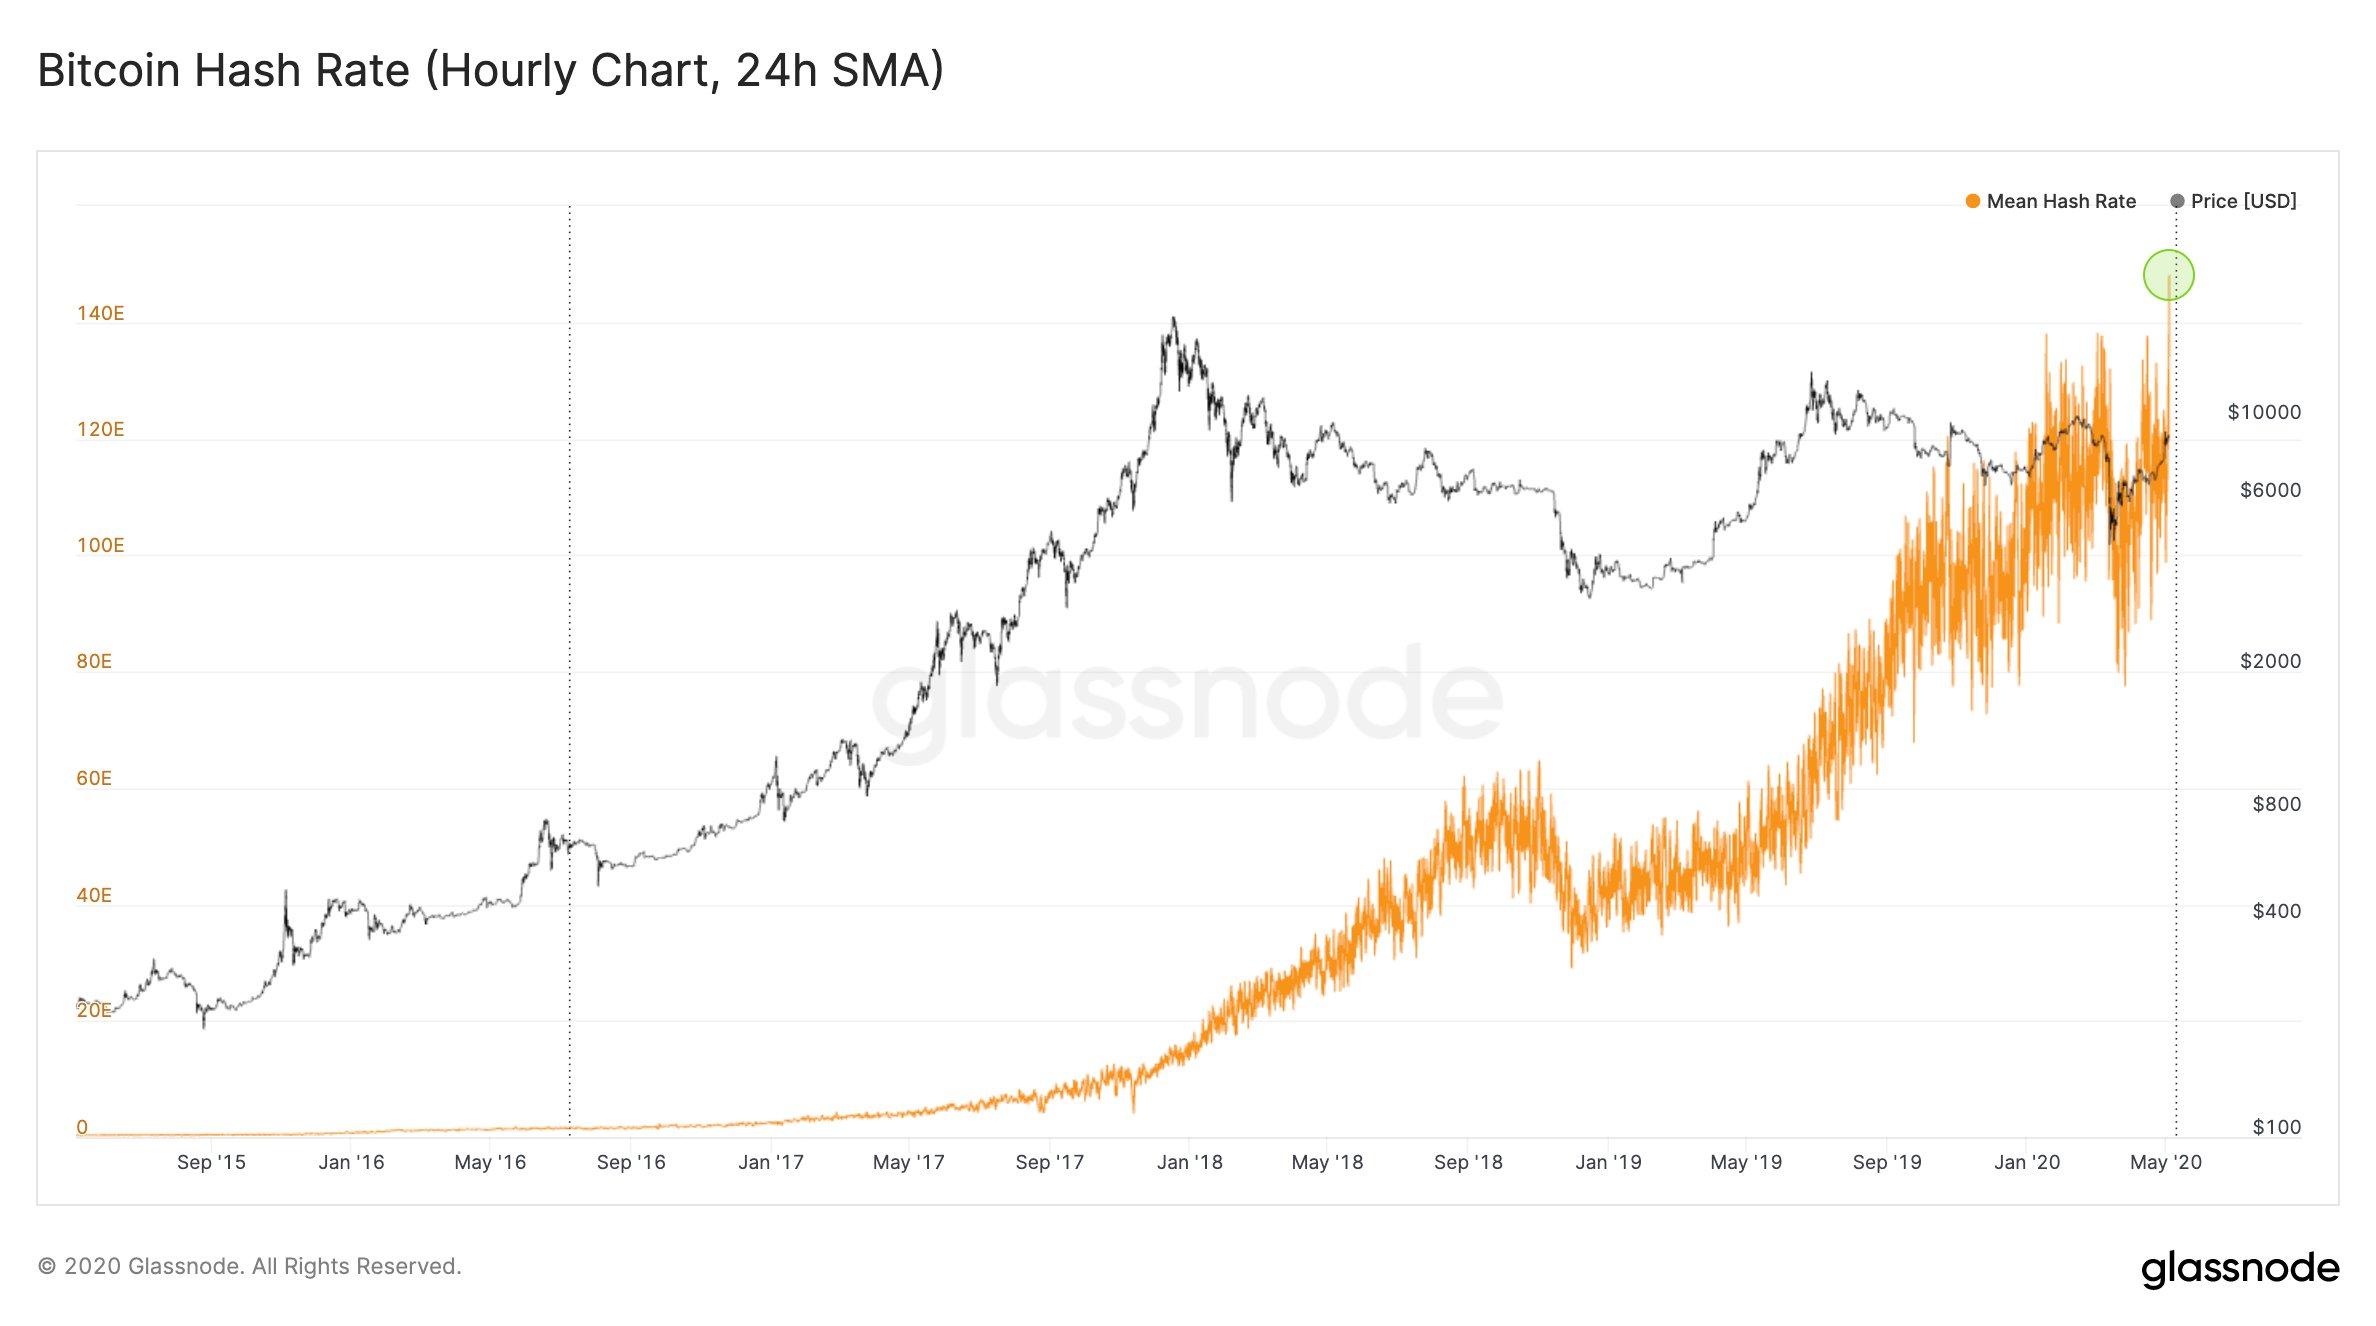 BTC Hash Rate